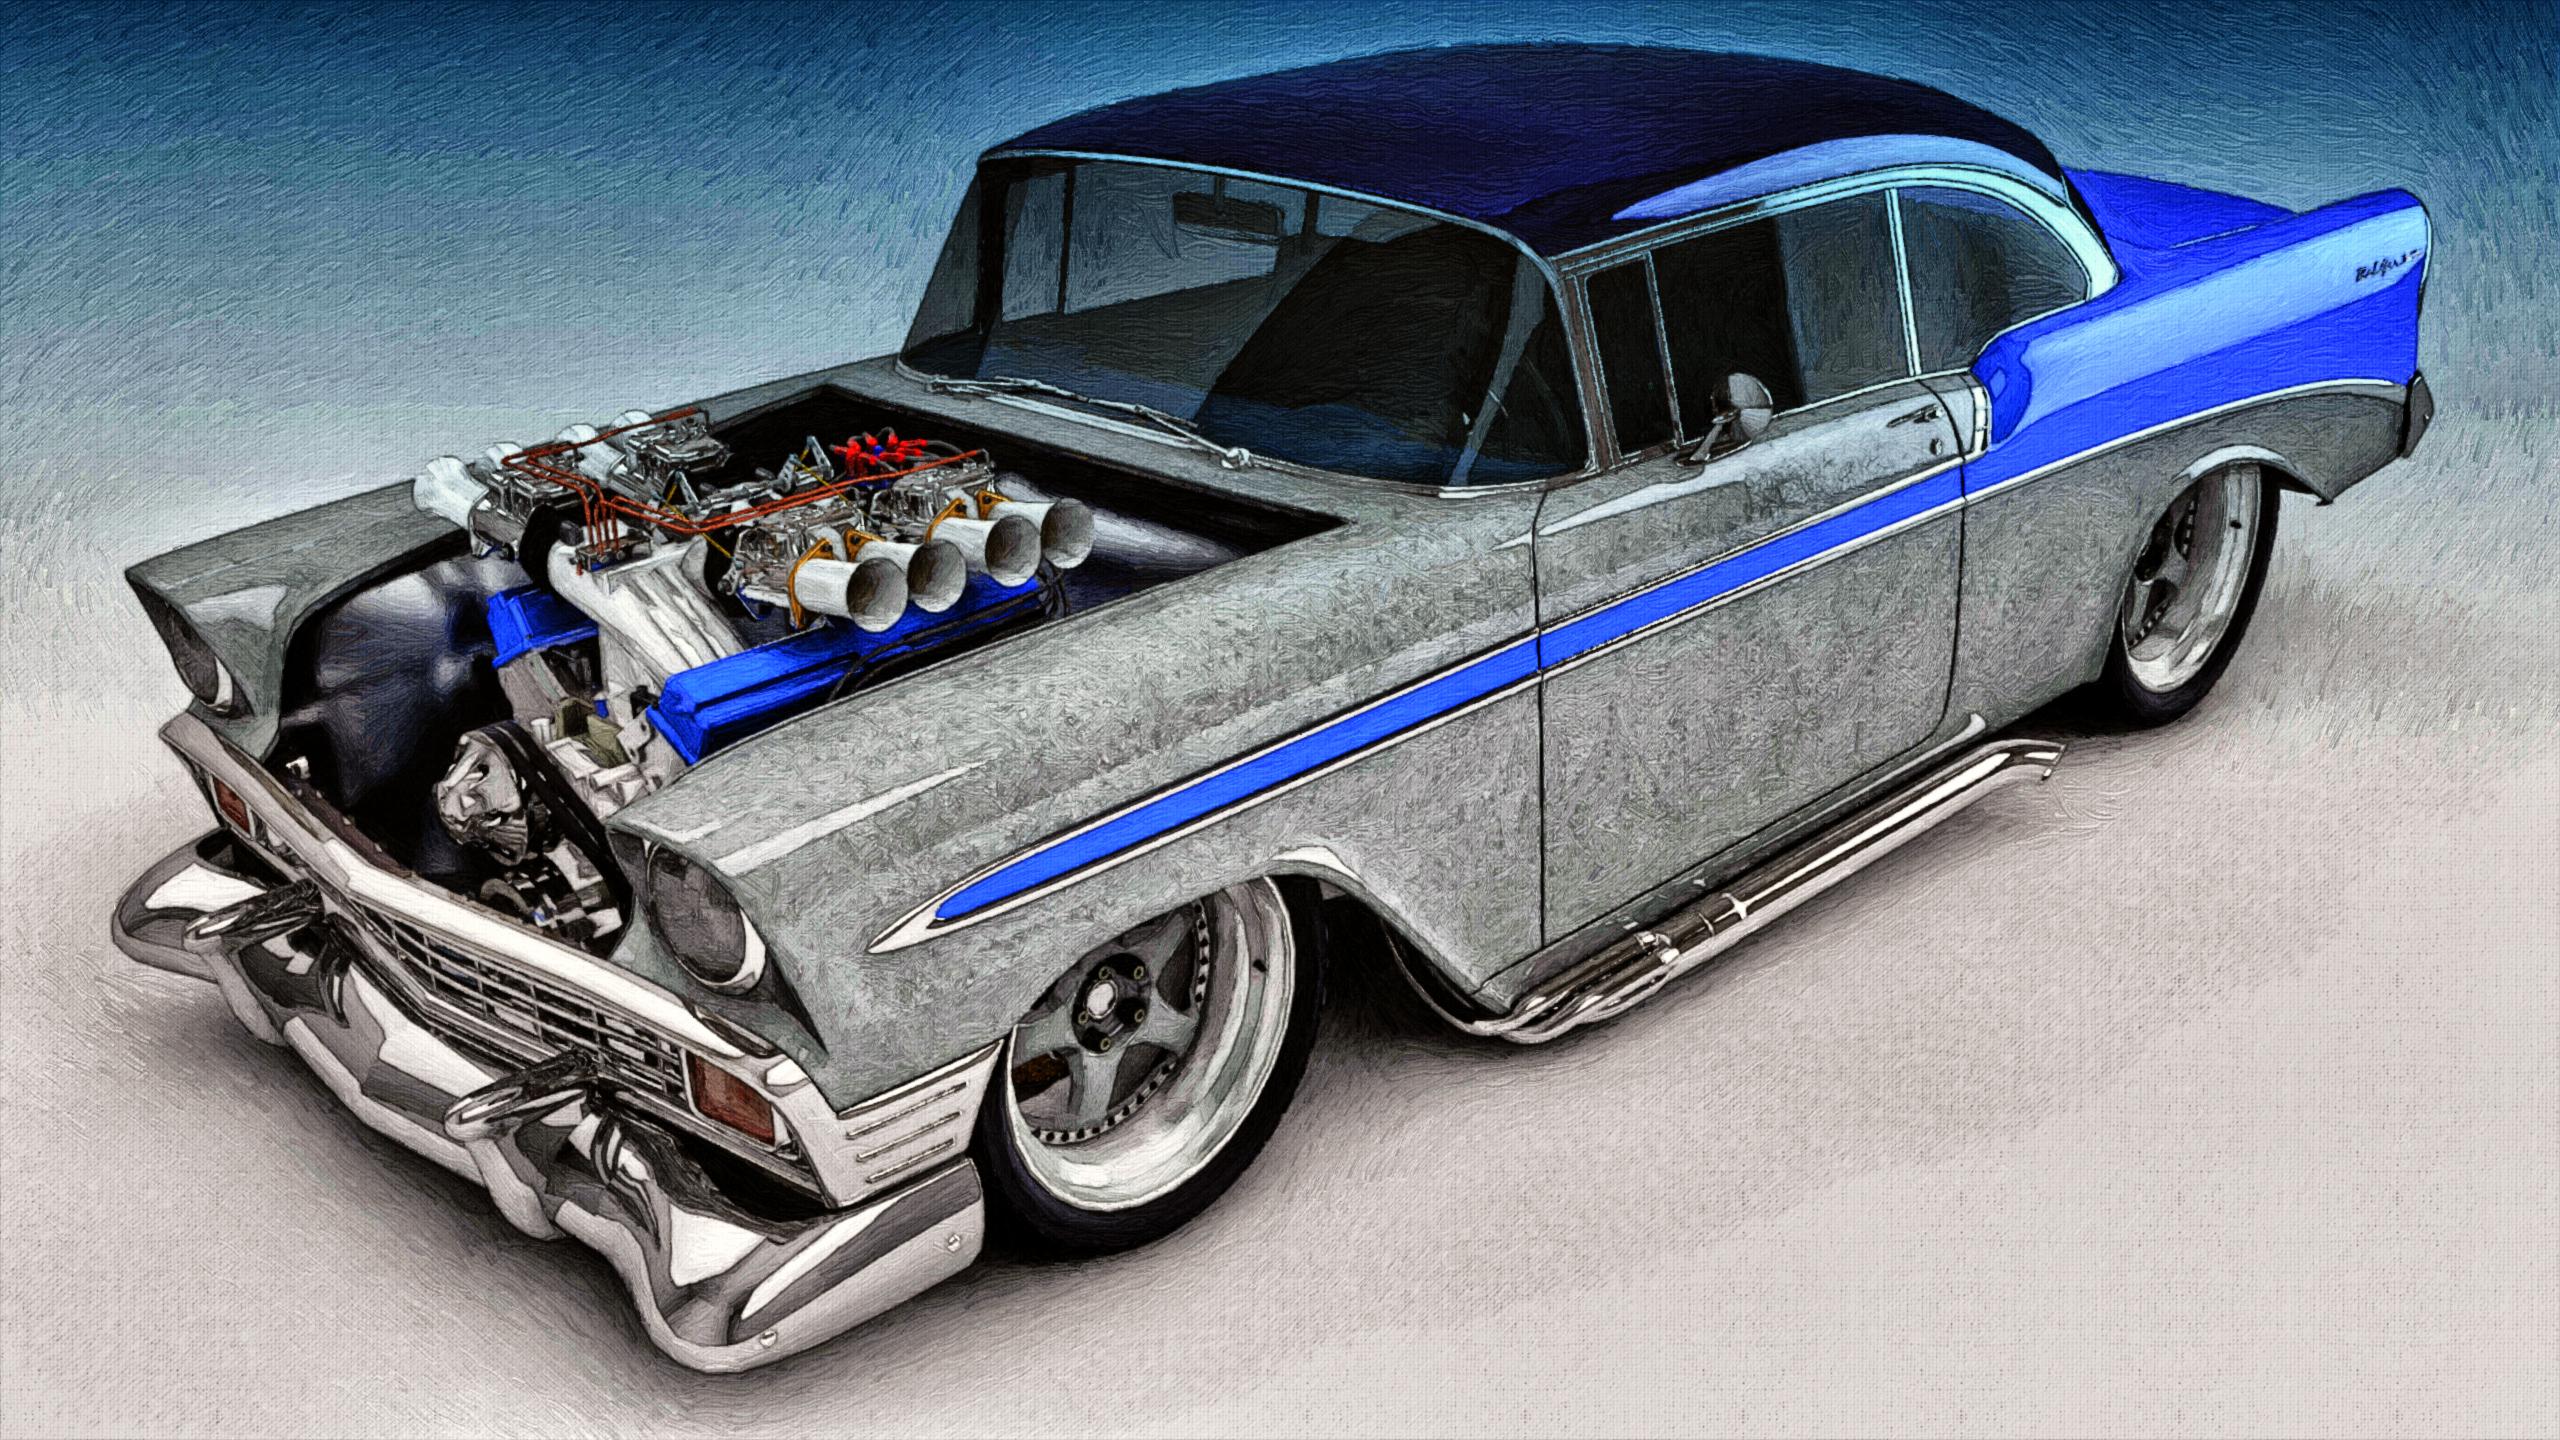 1956 chevrolet bel air custom 2 door post 161164 - 1956 Chevy Bel Air Custom By Samcurry On Deviantart 2560x1440 1956 Chevrolet Bel Air Custom 2 Door Post 161164 1000x668